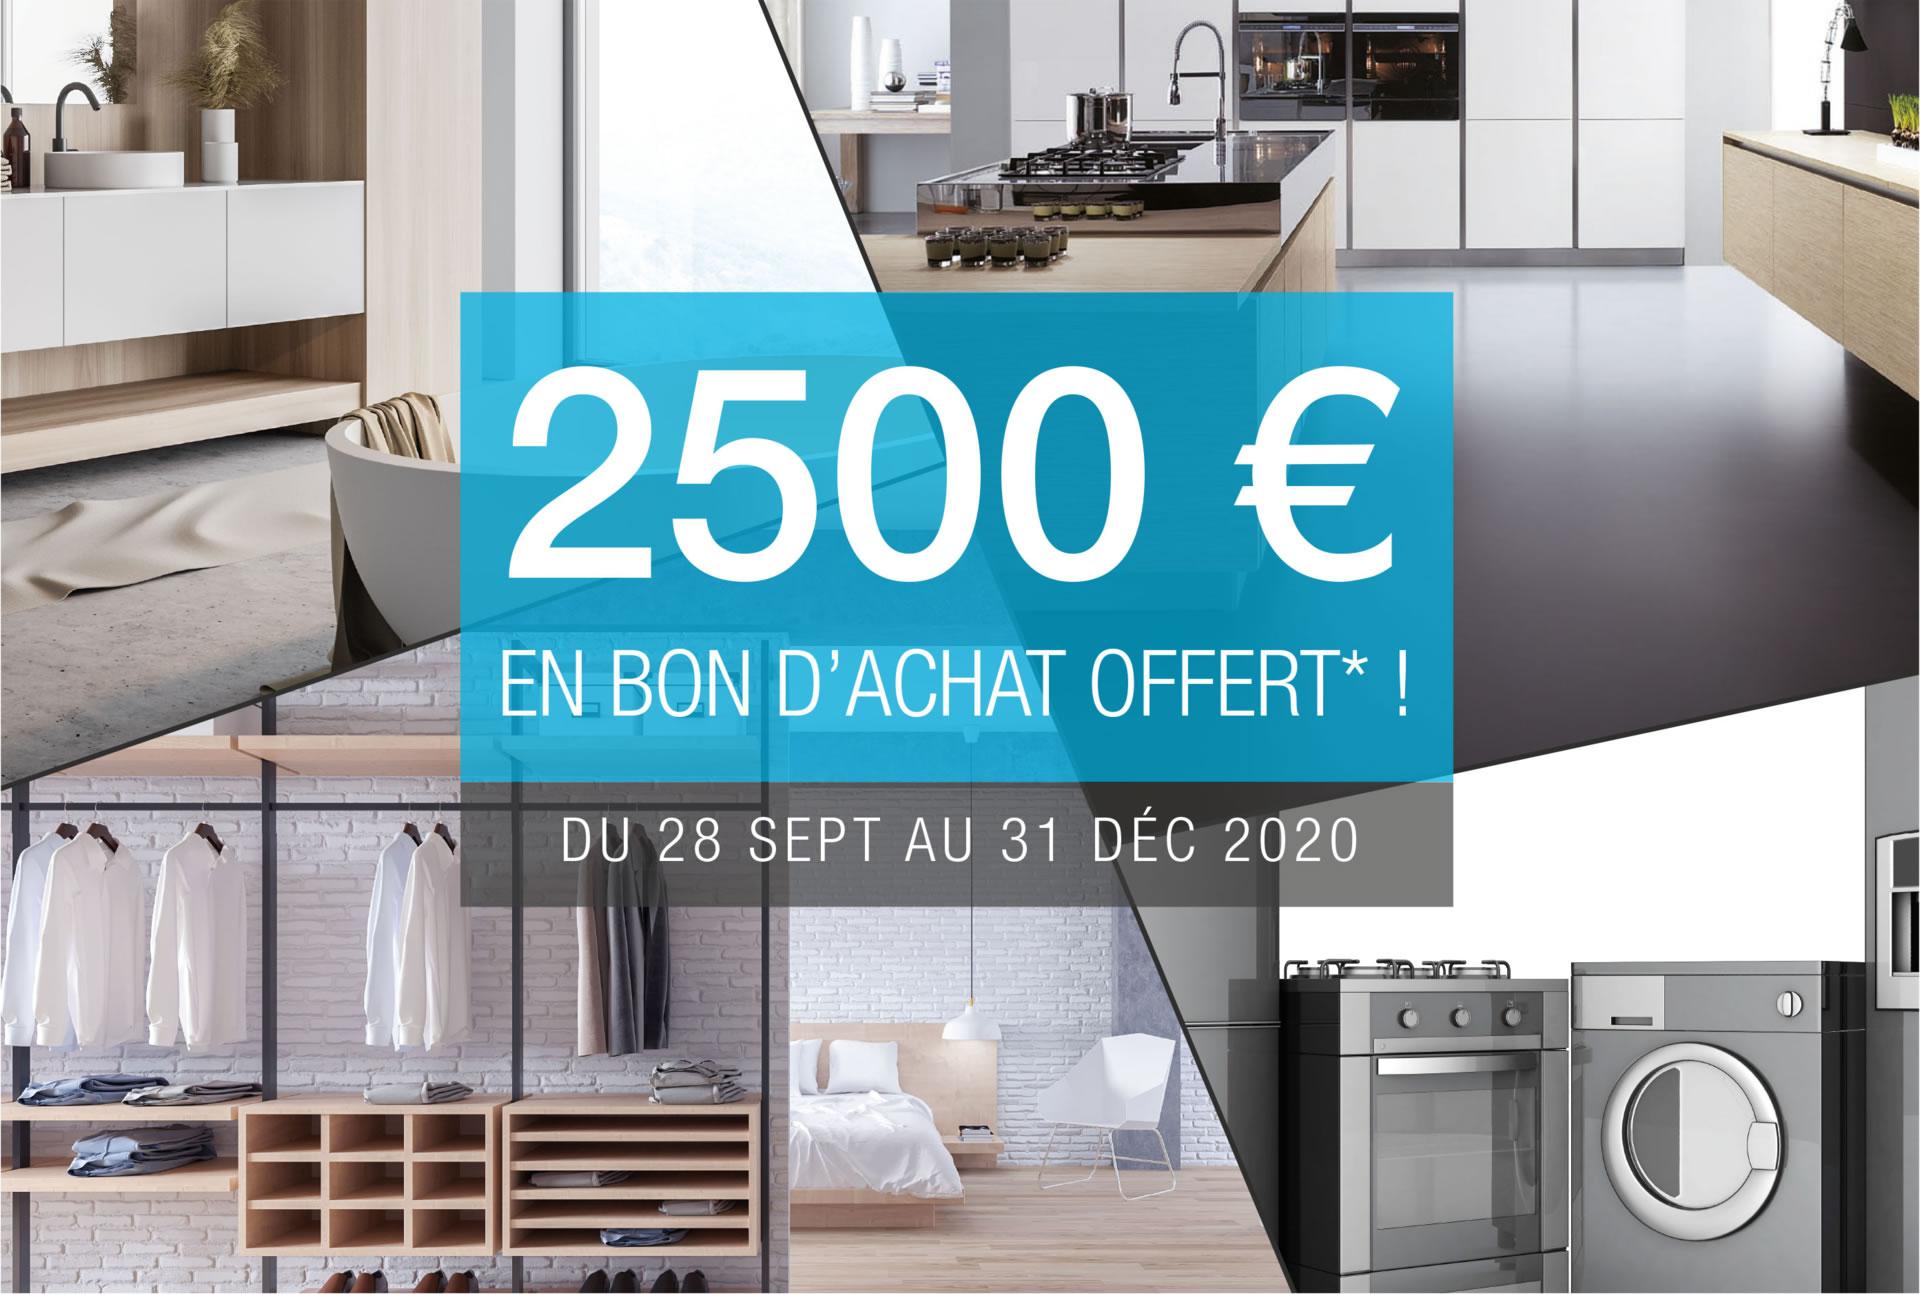 2500 € offerts en bon d'achat